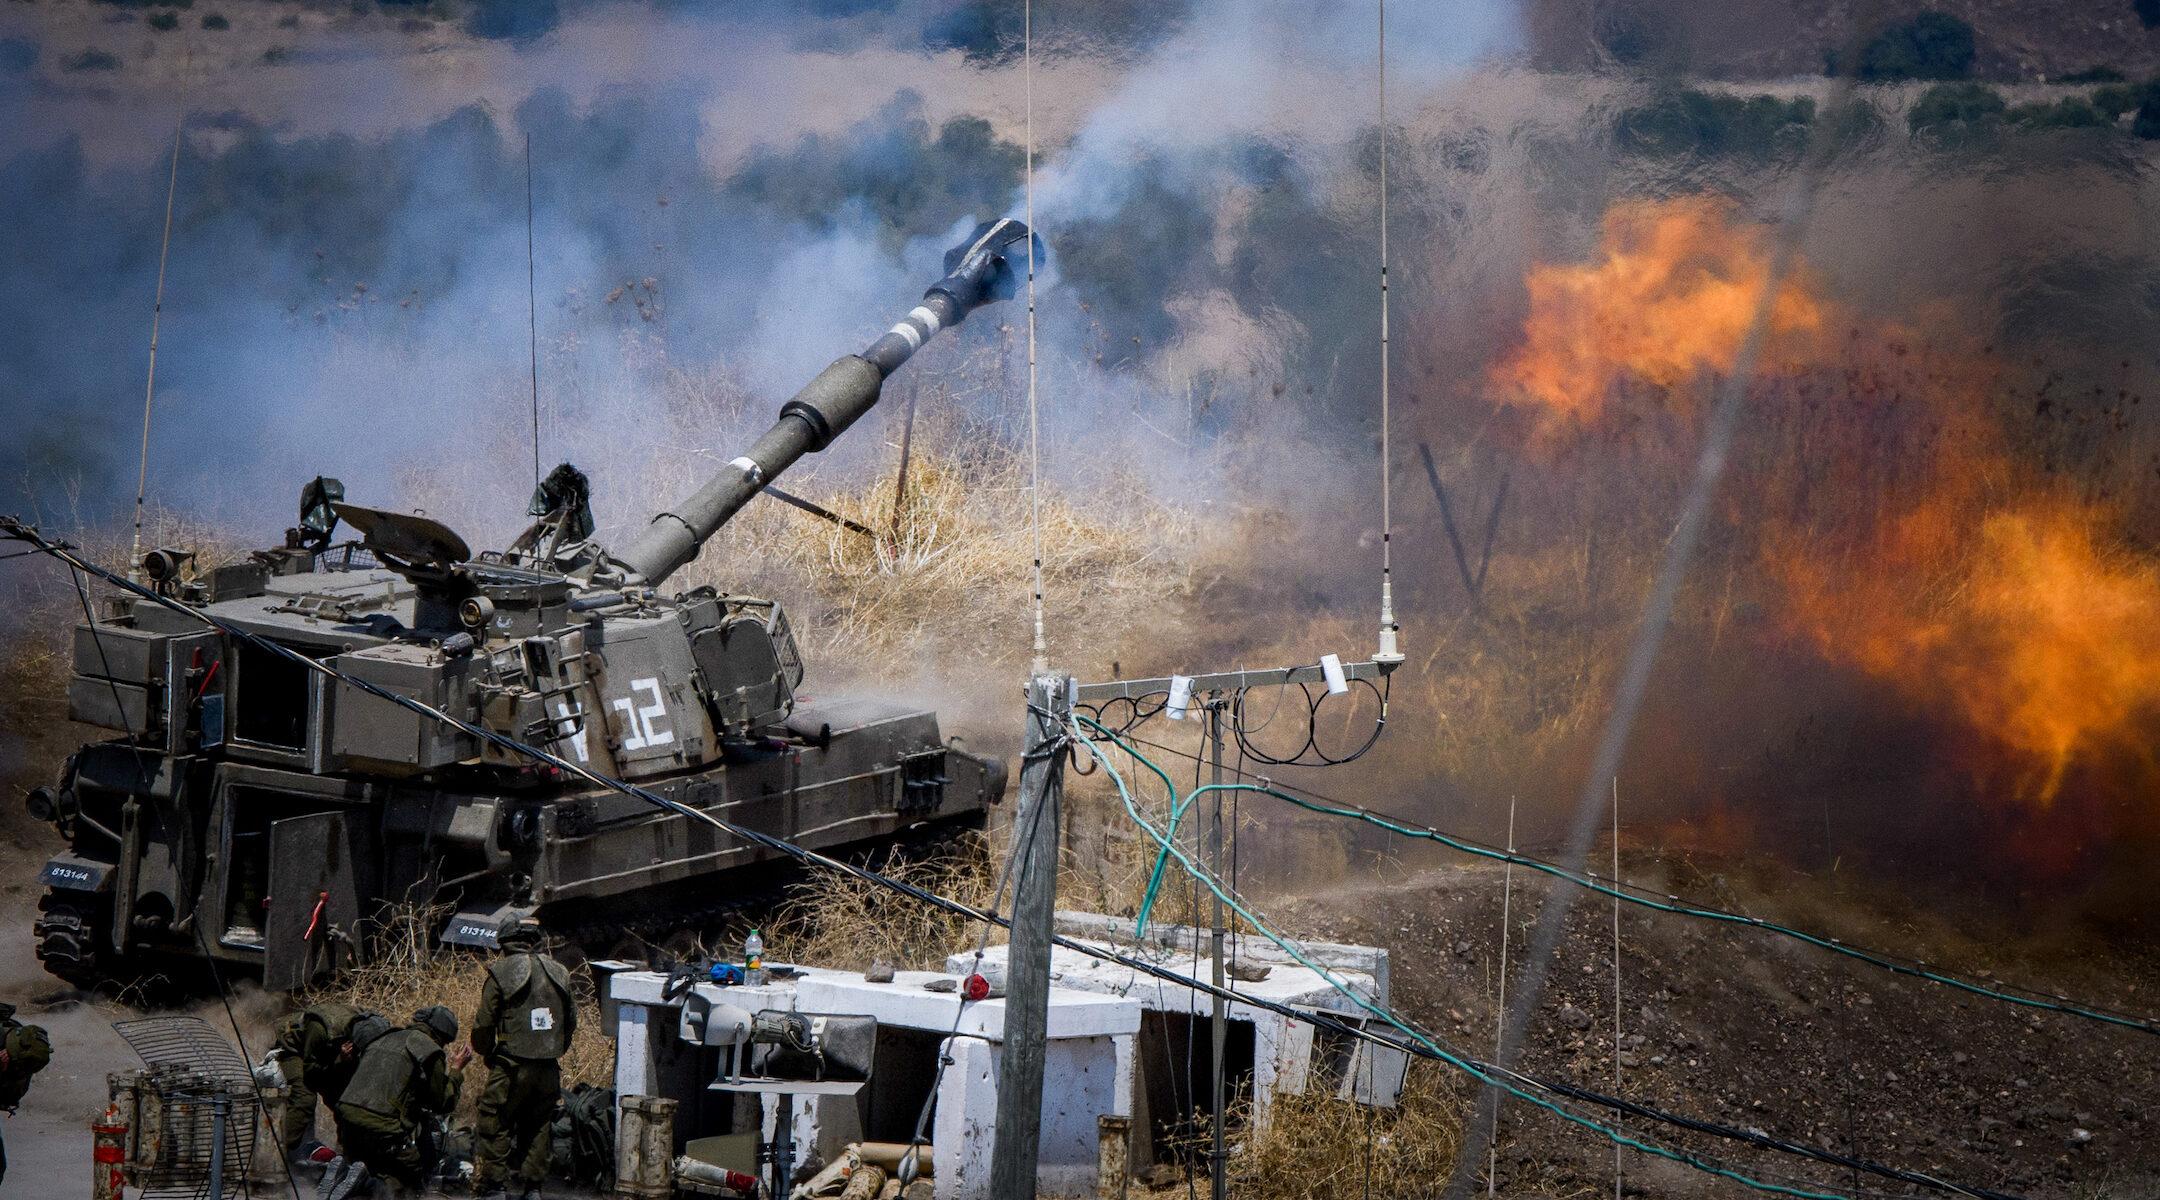 Israel fires into Lebanon